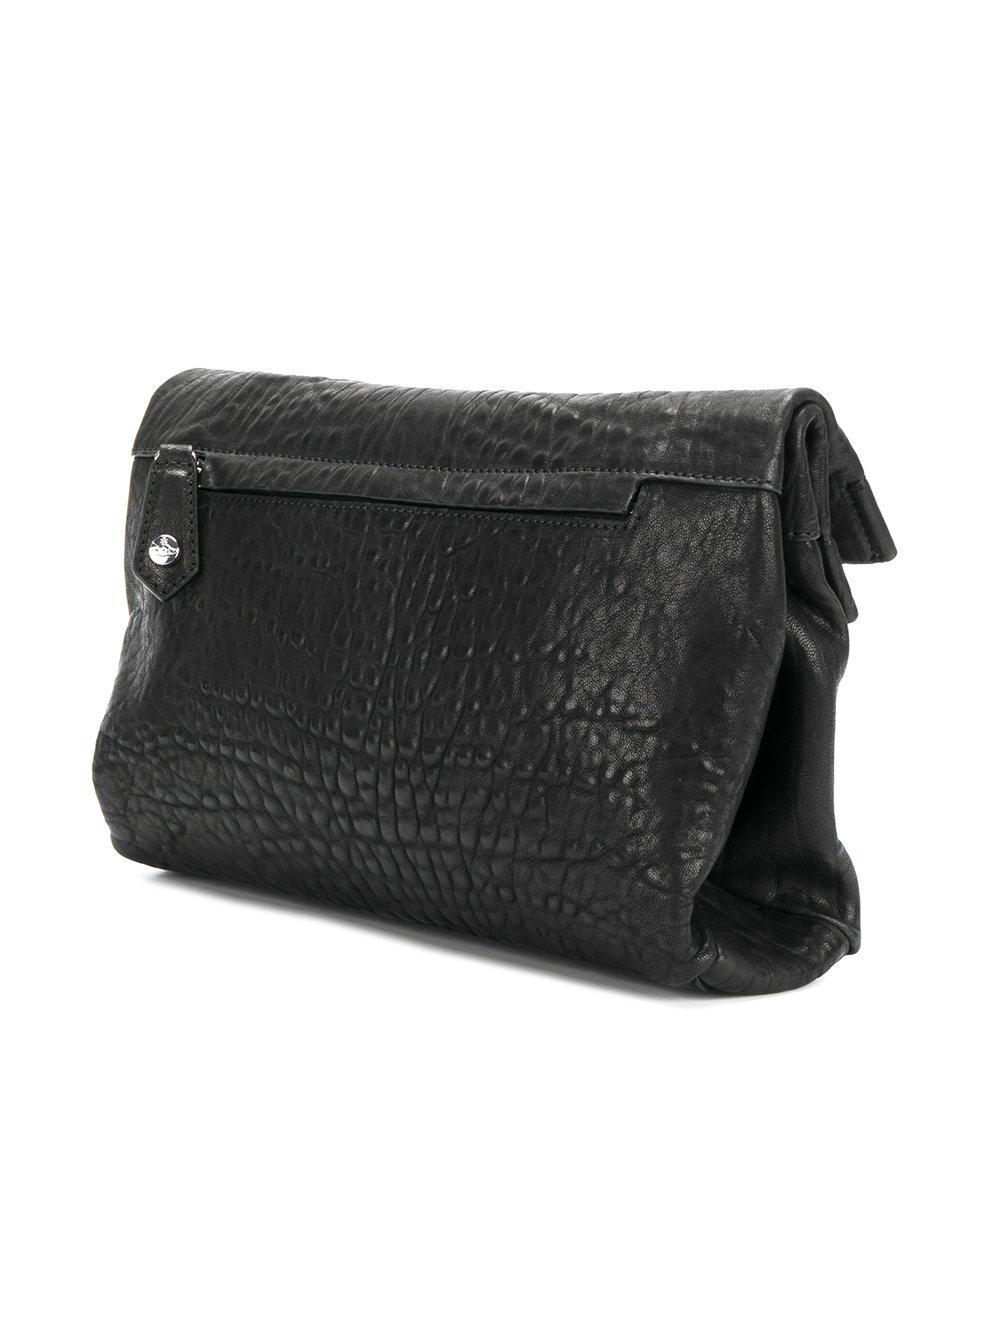 c1e113c008c Vivienne Westwood Oxford Clutch Bag in Black - Lyst